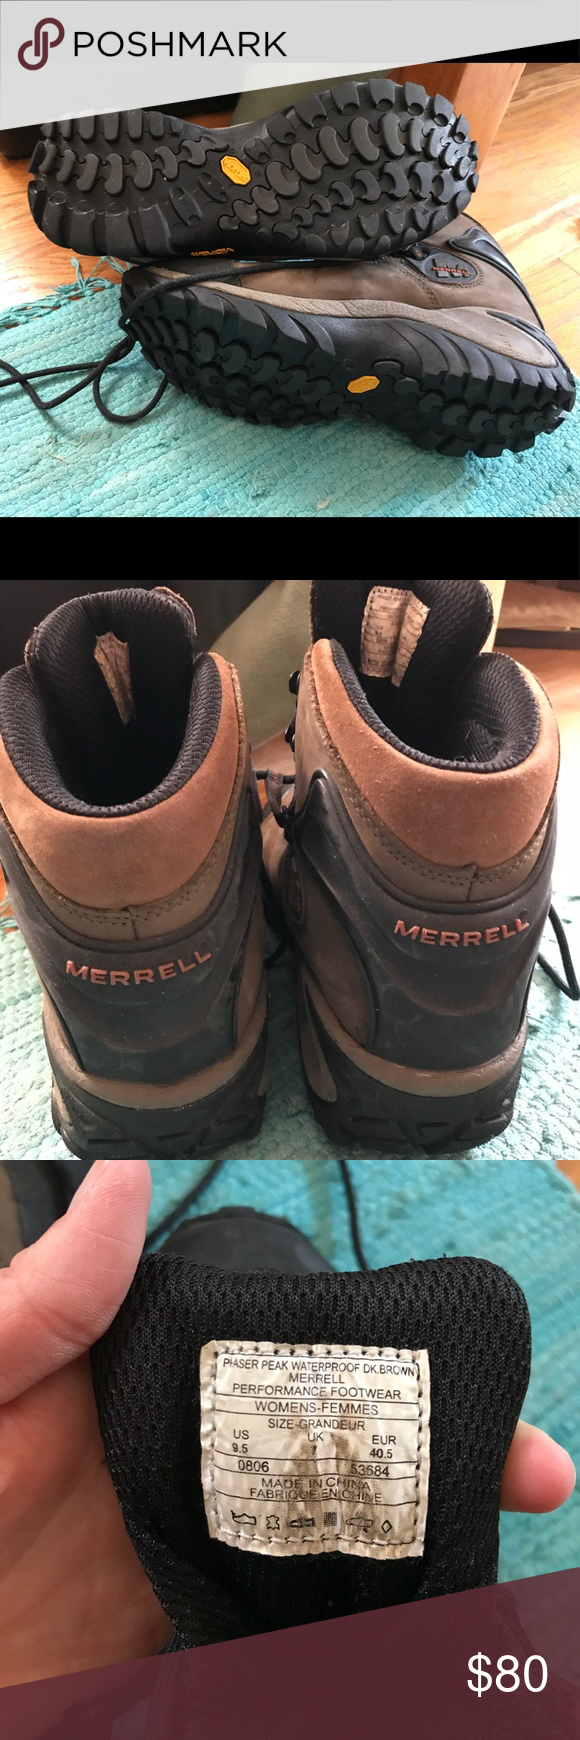 f343809947f Merrell Phaser Peak hiking boots Women's size 9.5 Women's waterproof ...